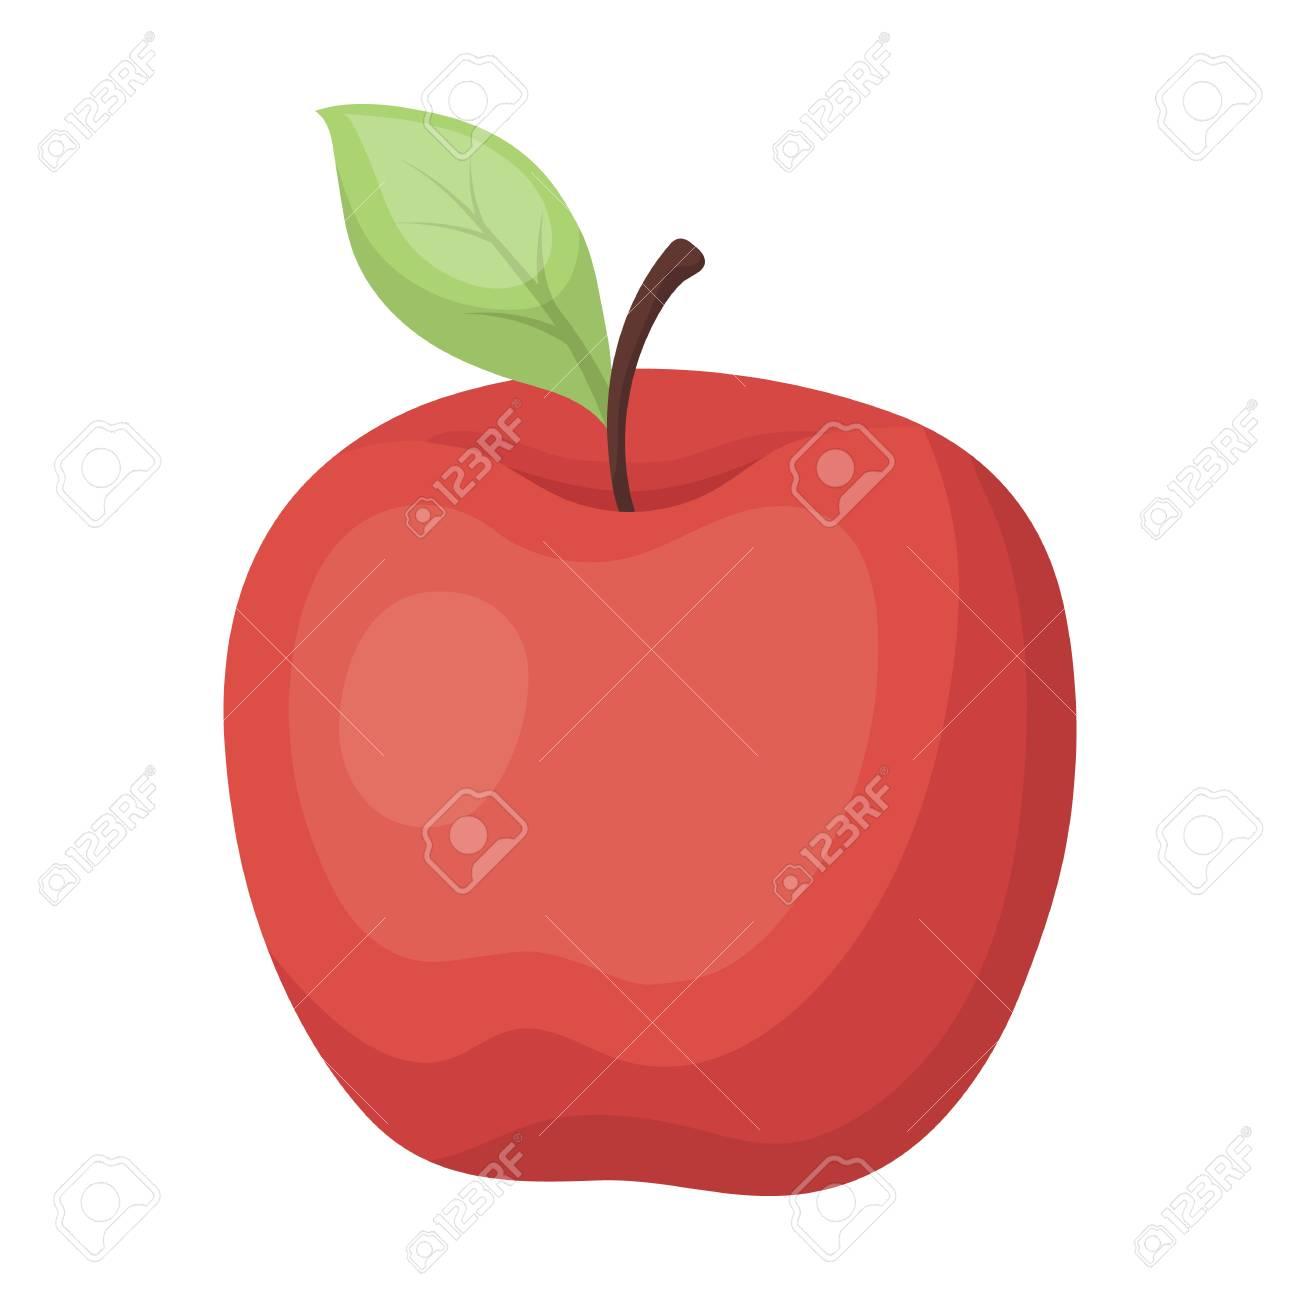 Maca Vermelha Lanche Na Escola Almoco Na Ruptura Escola E